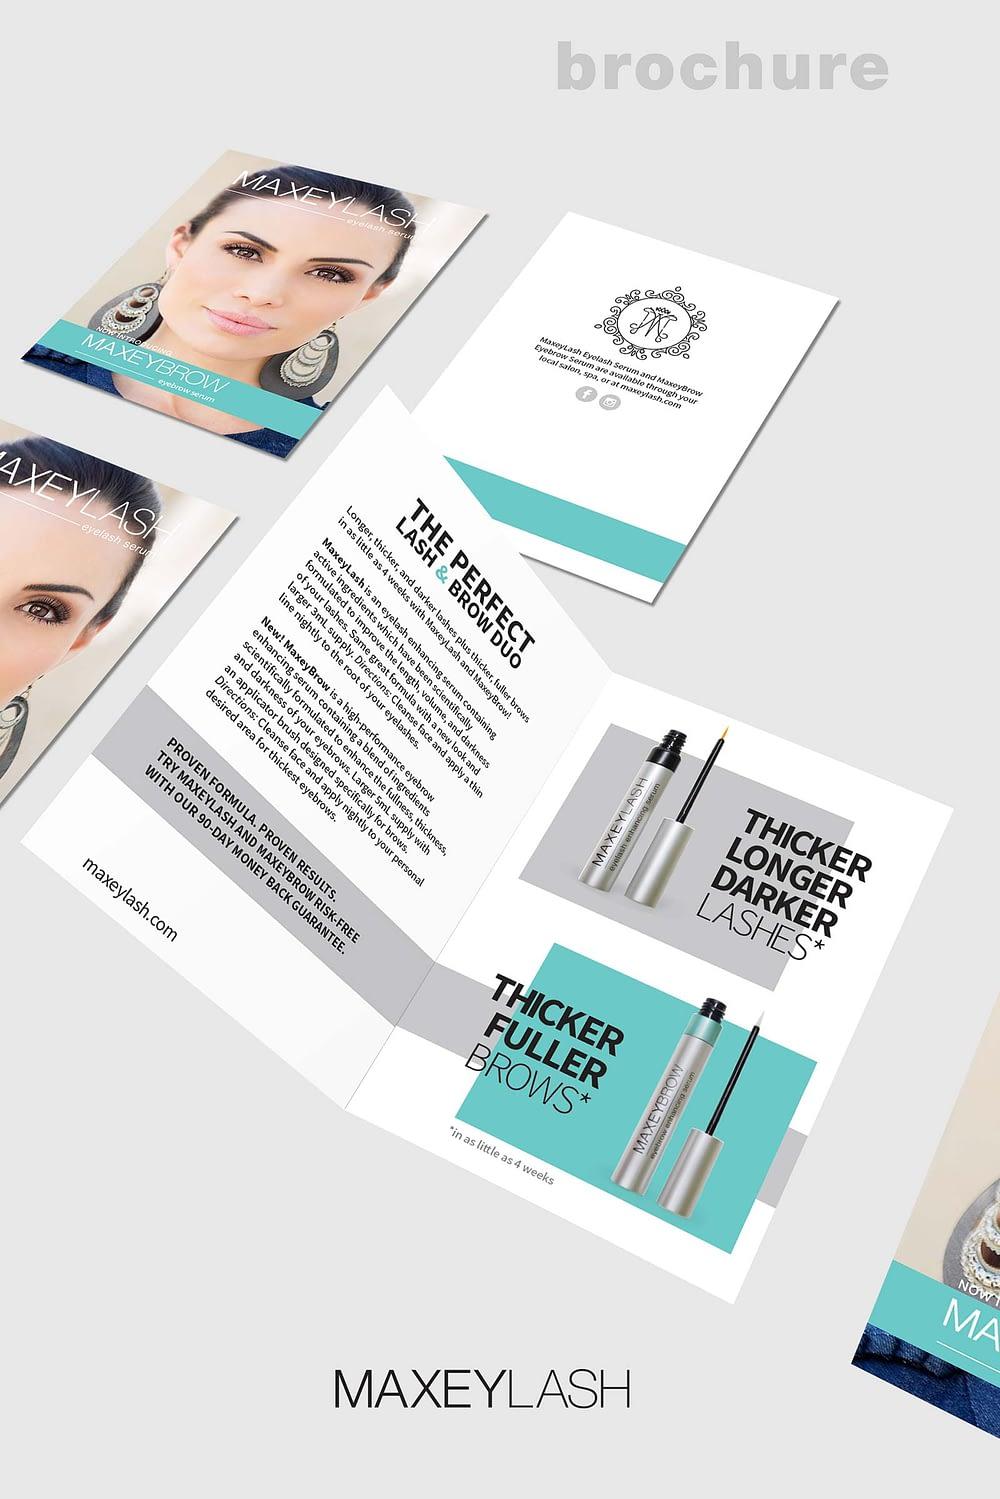 brochure-design-maxeylash